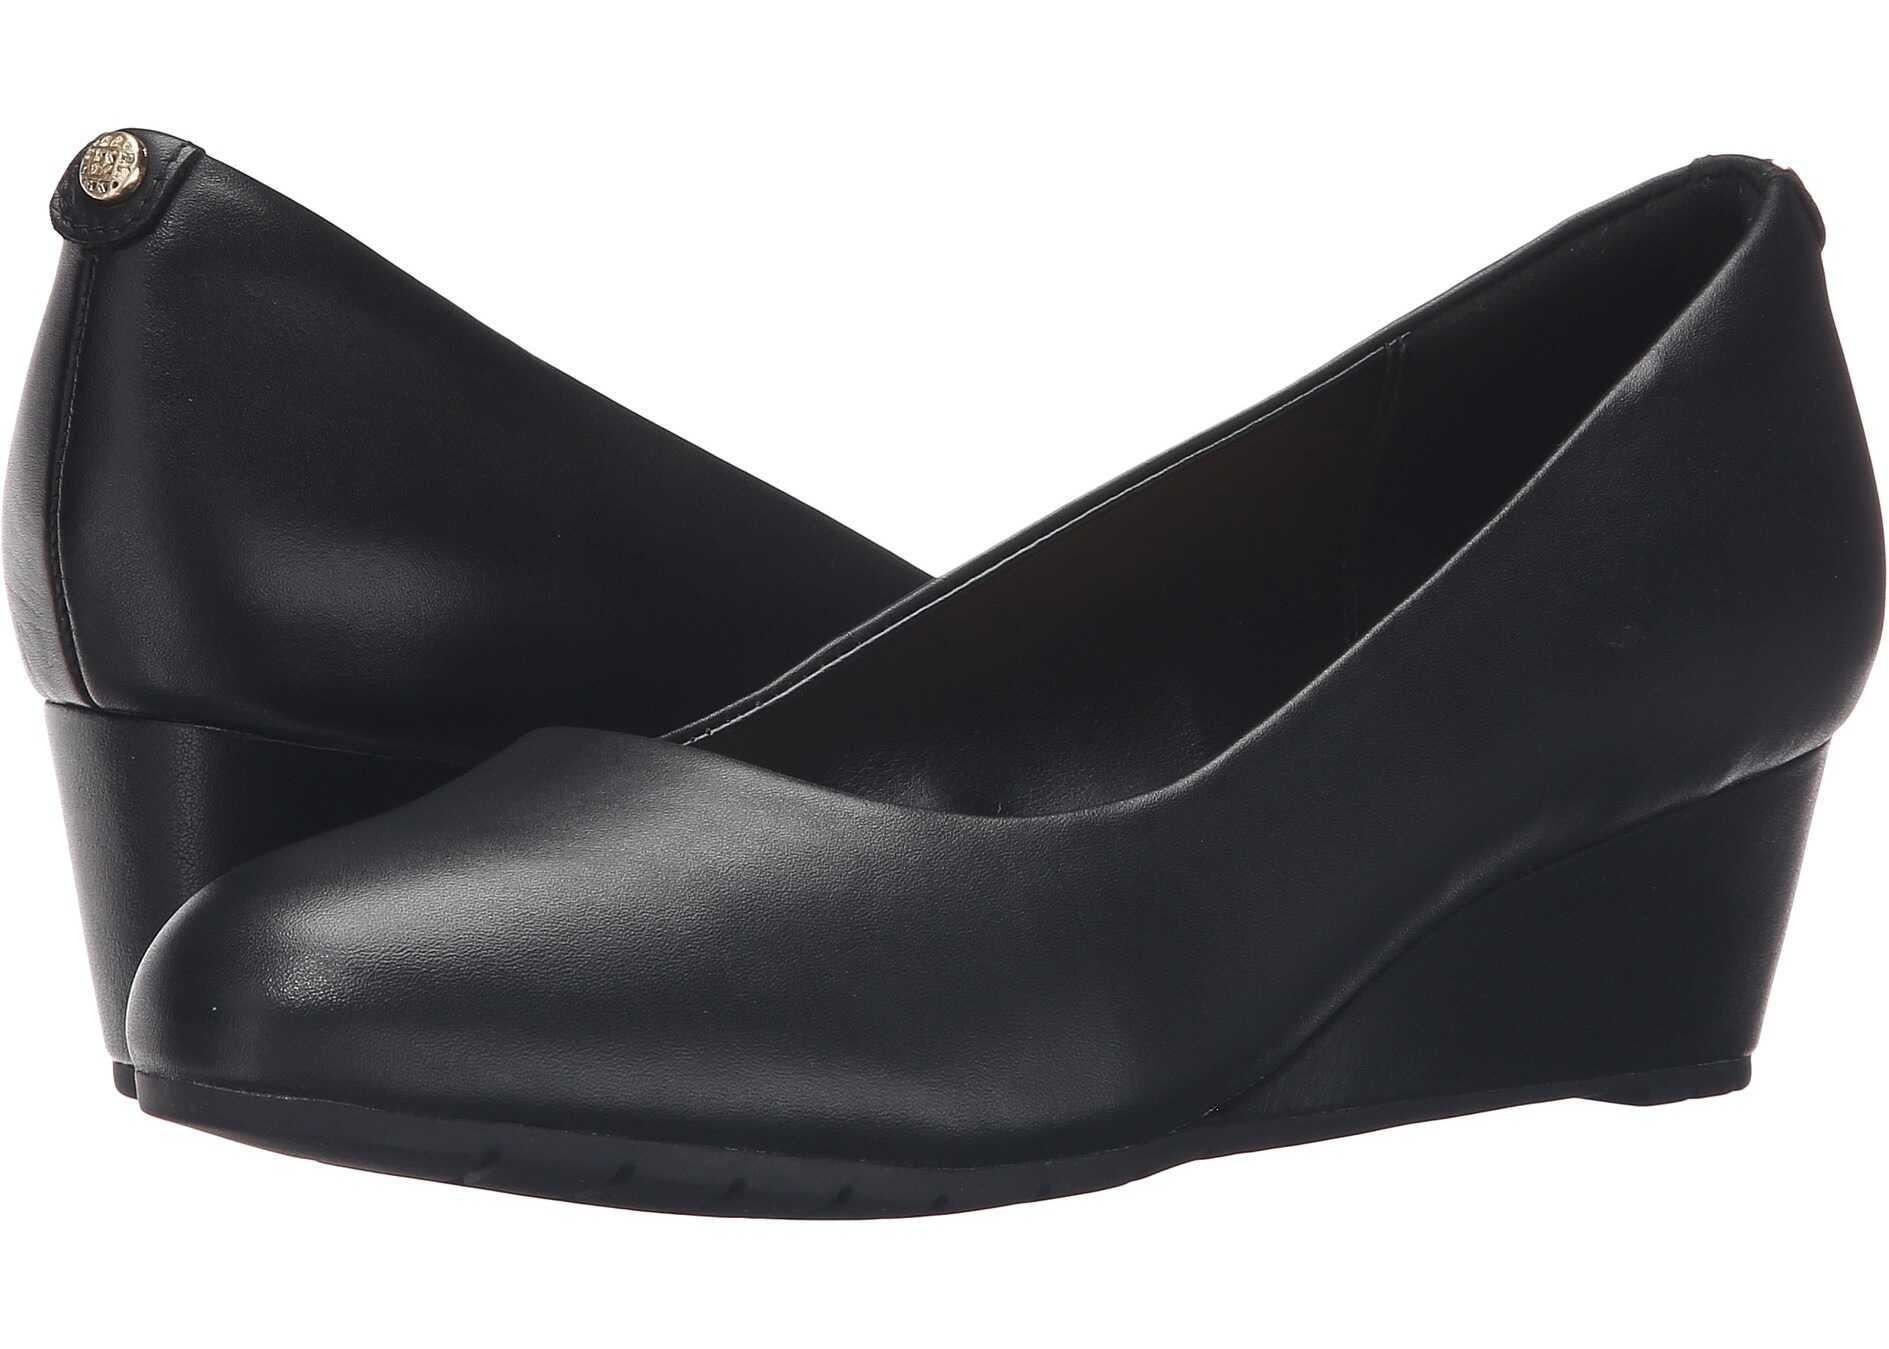 Clarks Vendra Bloom Black Leather